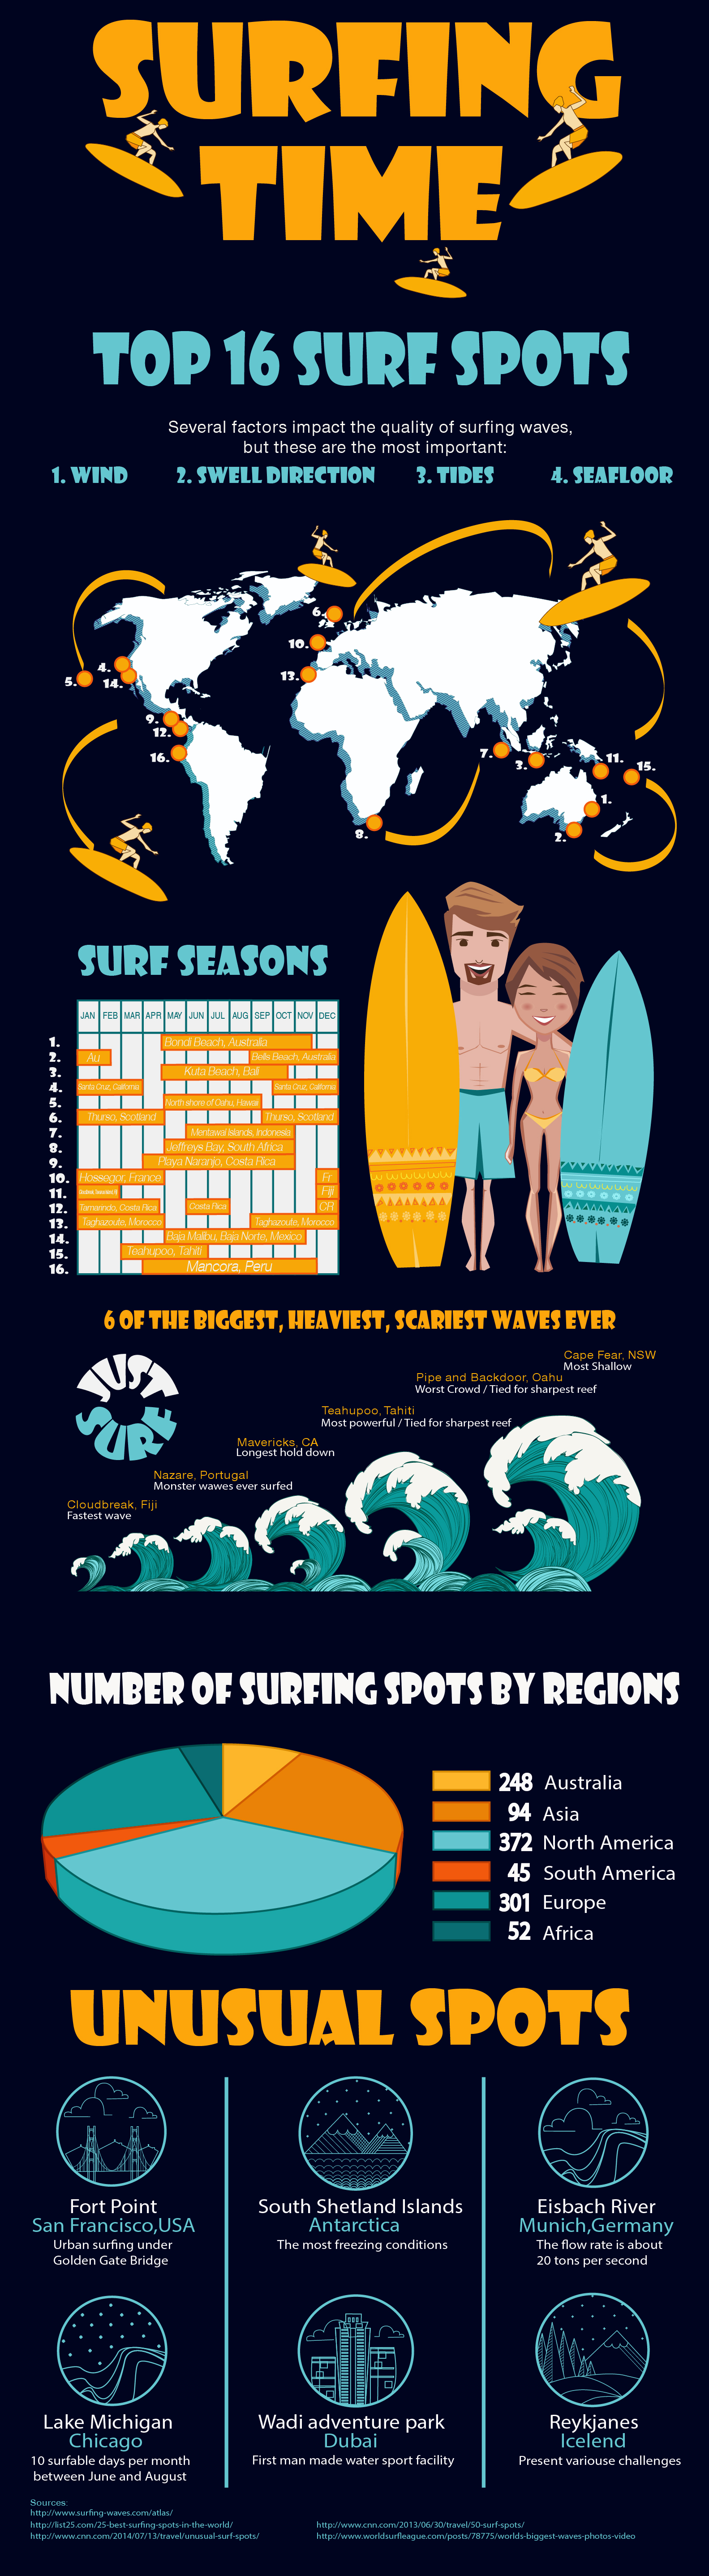 https://www.behance.net/gallery/37984115/Surfing-infographic-Top-surfing-spots #art #inspiration # infographic #surfing #surf #top #surfingspots #illustration #wave #summer #activities #surfboard #character #graphicdesign